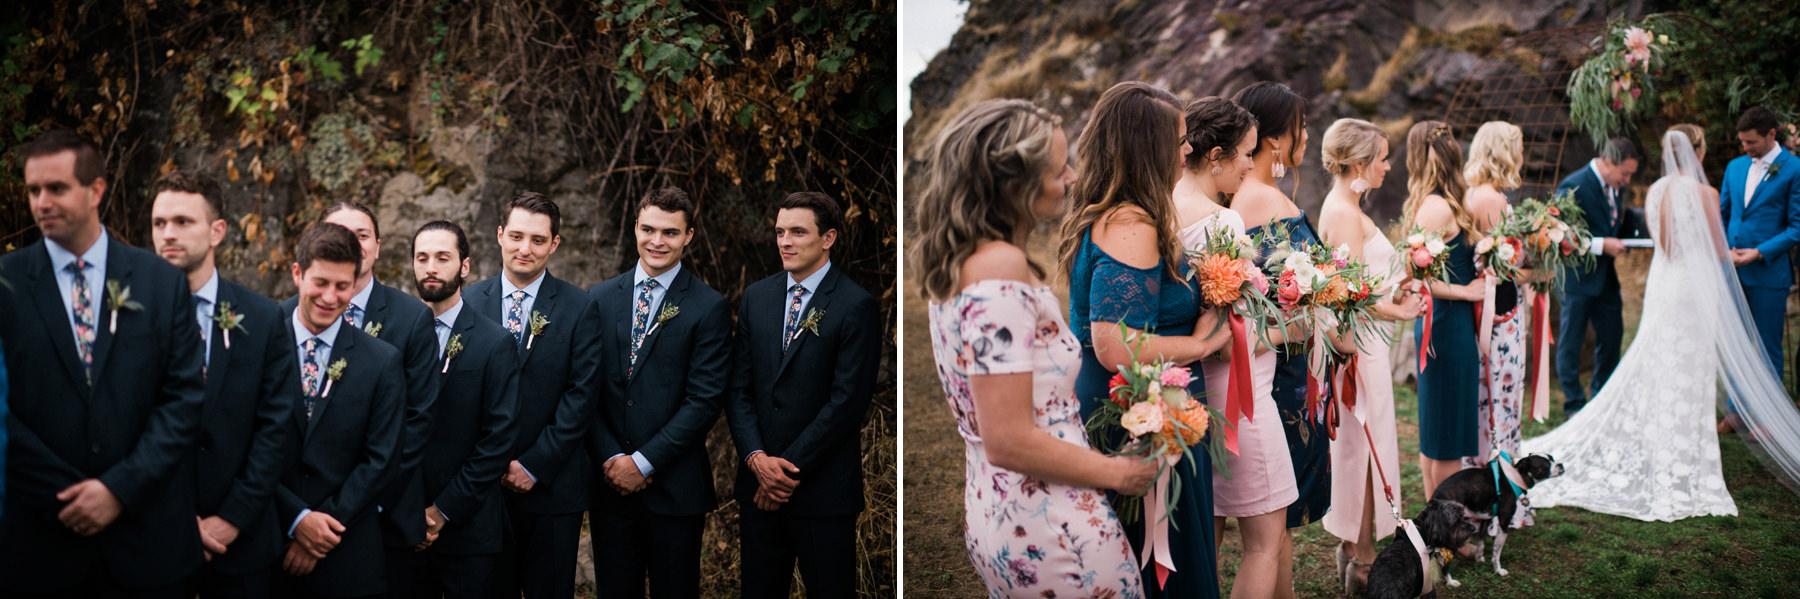 323-colorful-outdoor-lopez-island-wedding.jpg